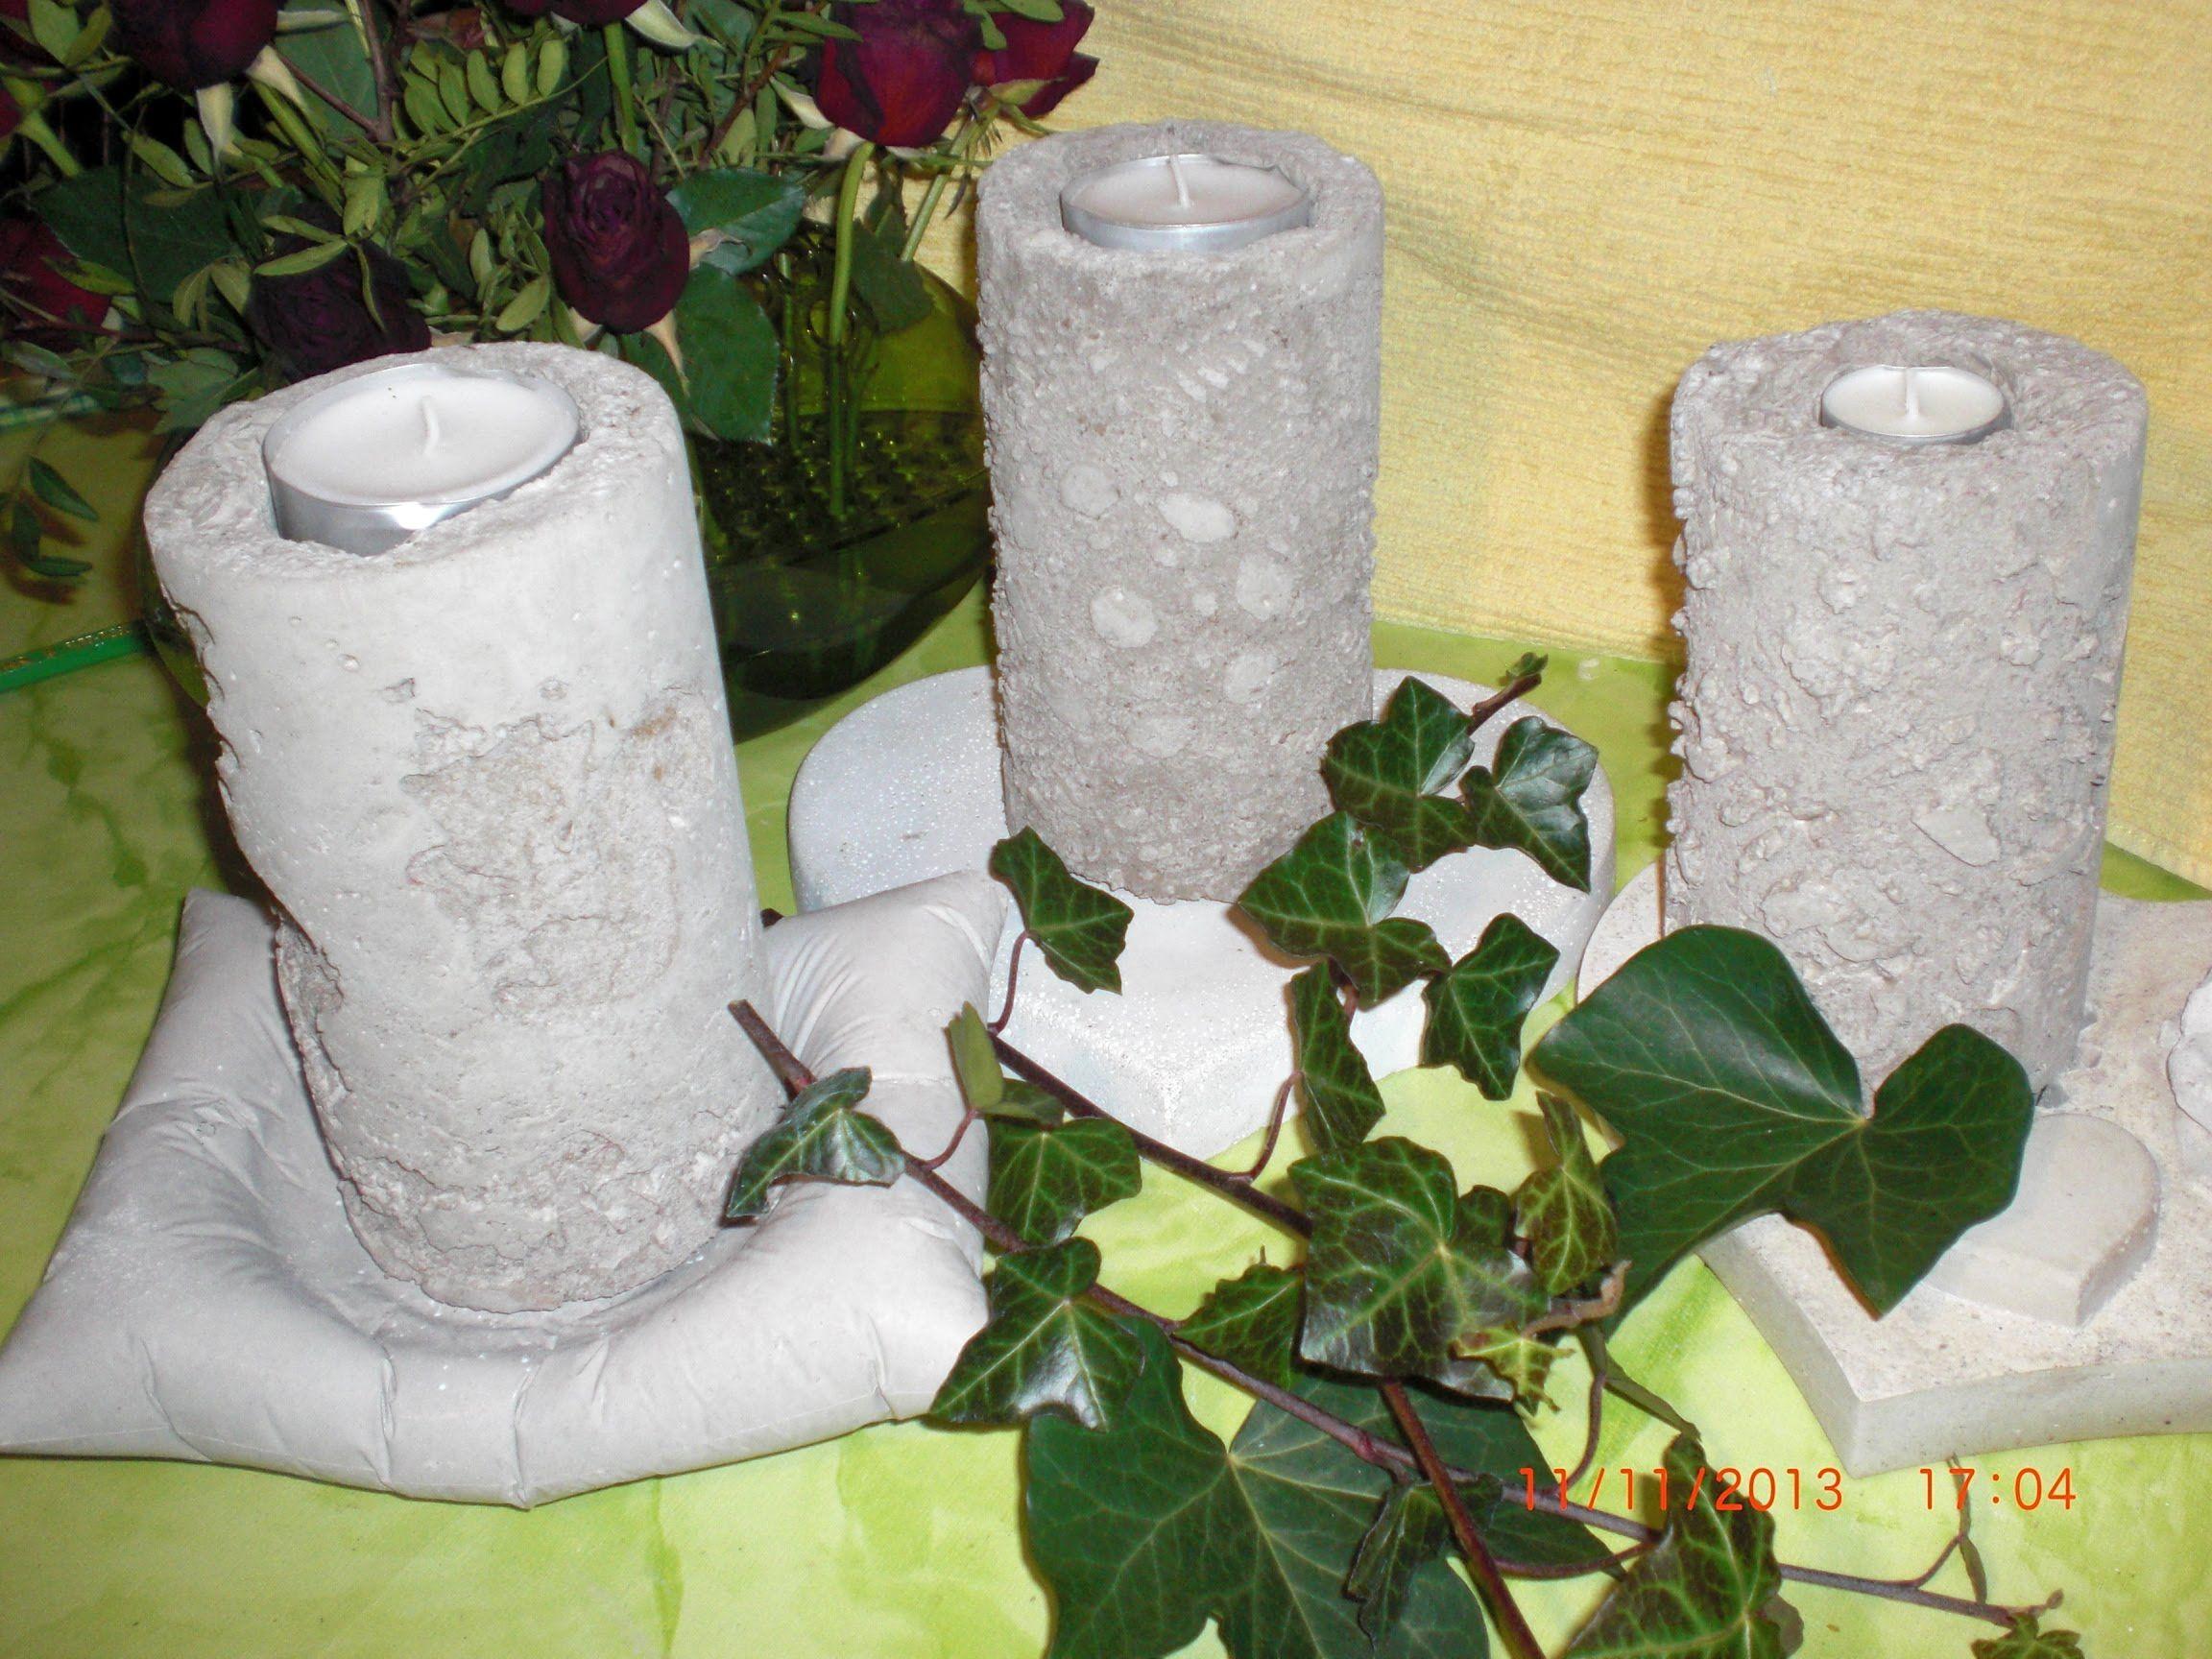 Beton Gießen beton giessen tolle muster in den beton zaubern concrete